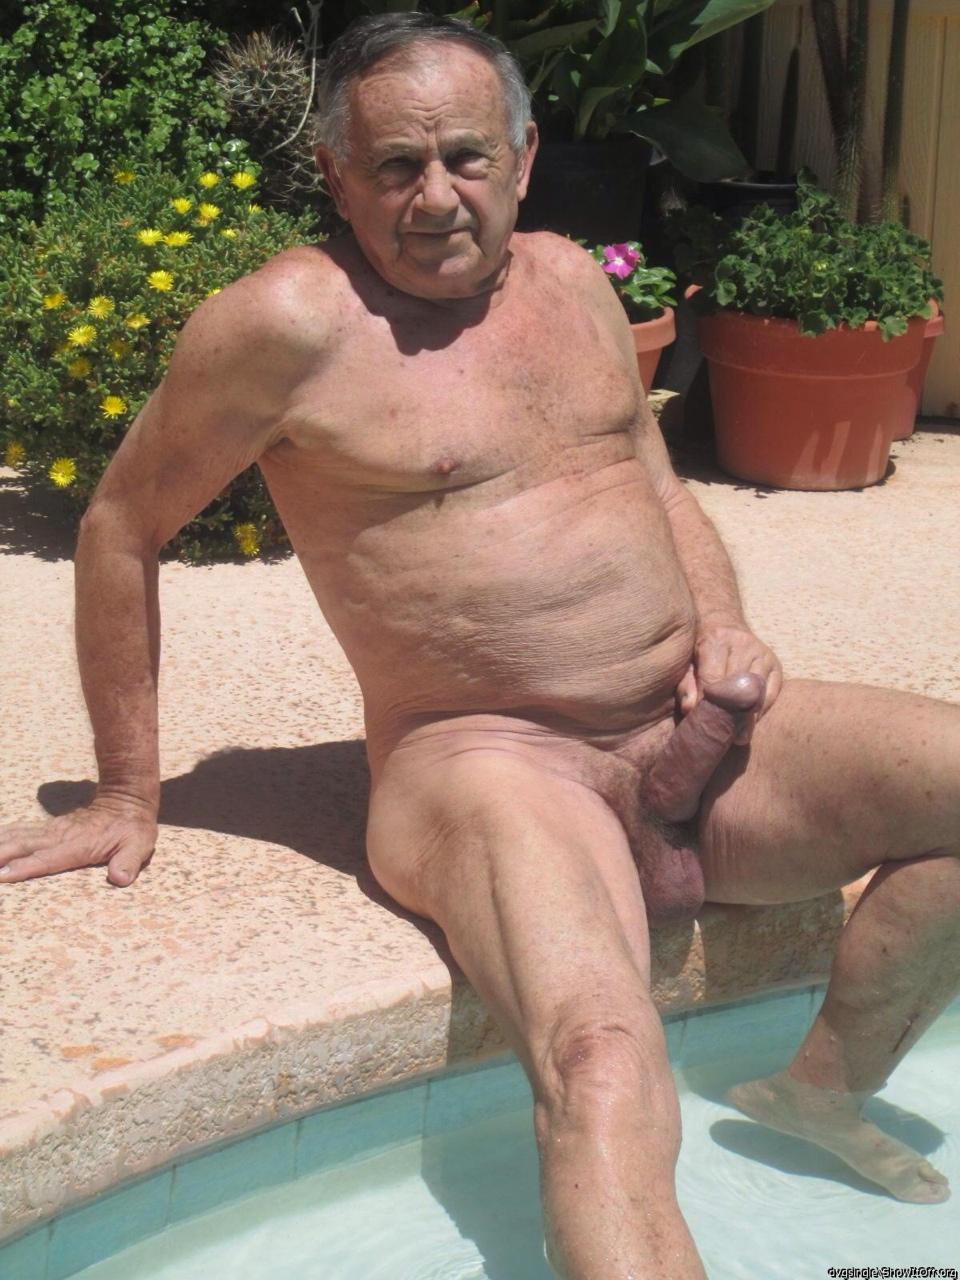 anatoly top big dick goncharov gay fiction literature